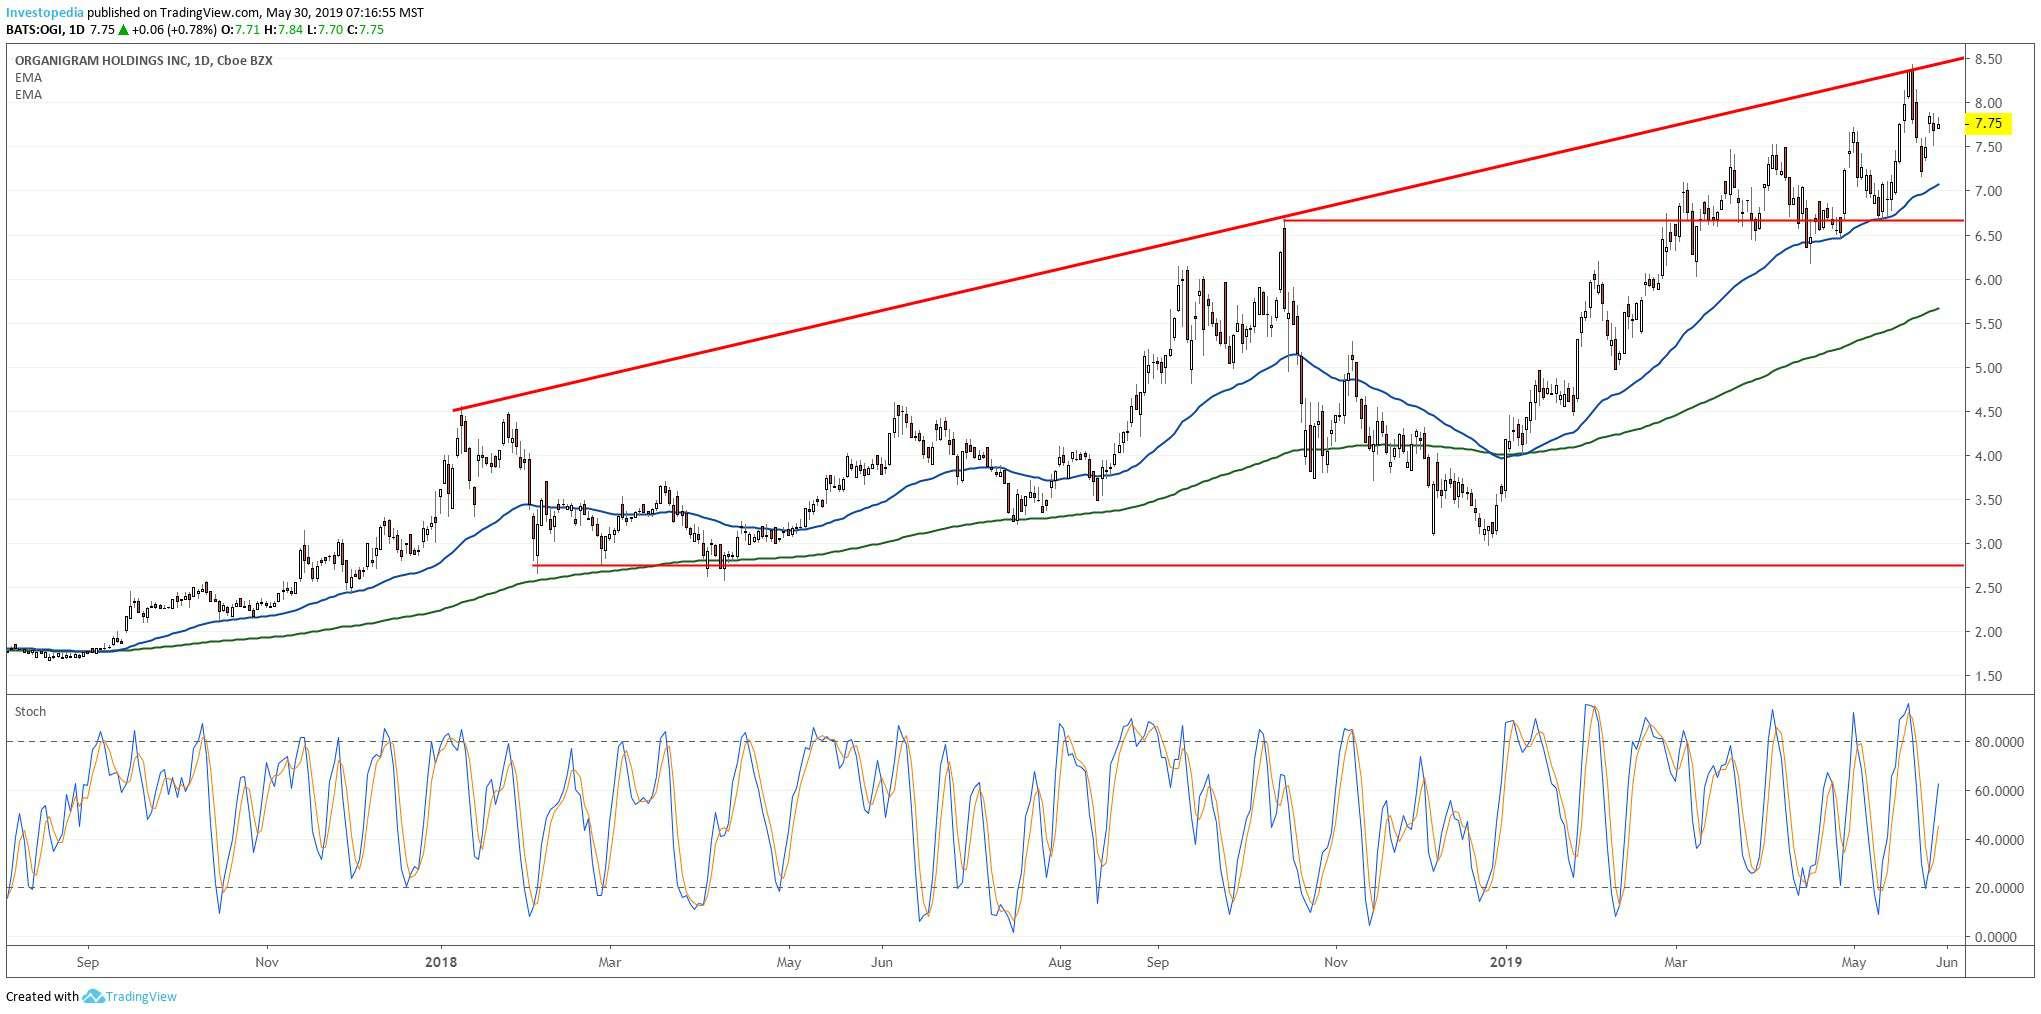 3 Small-Cap Stocks Near New Highs